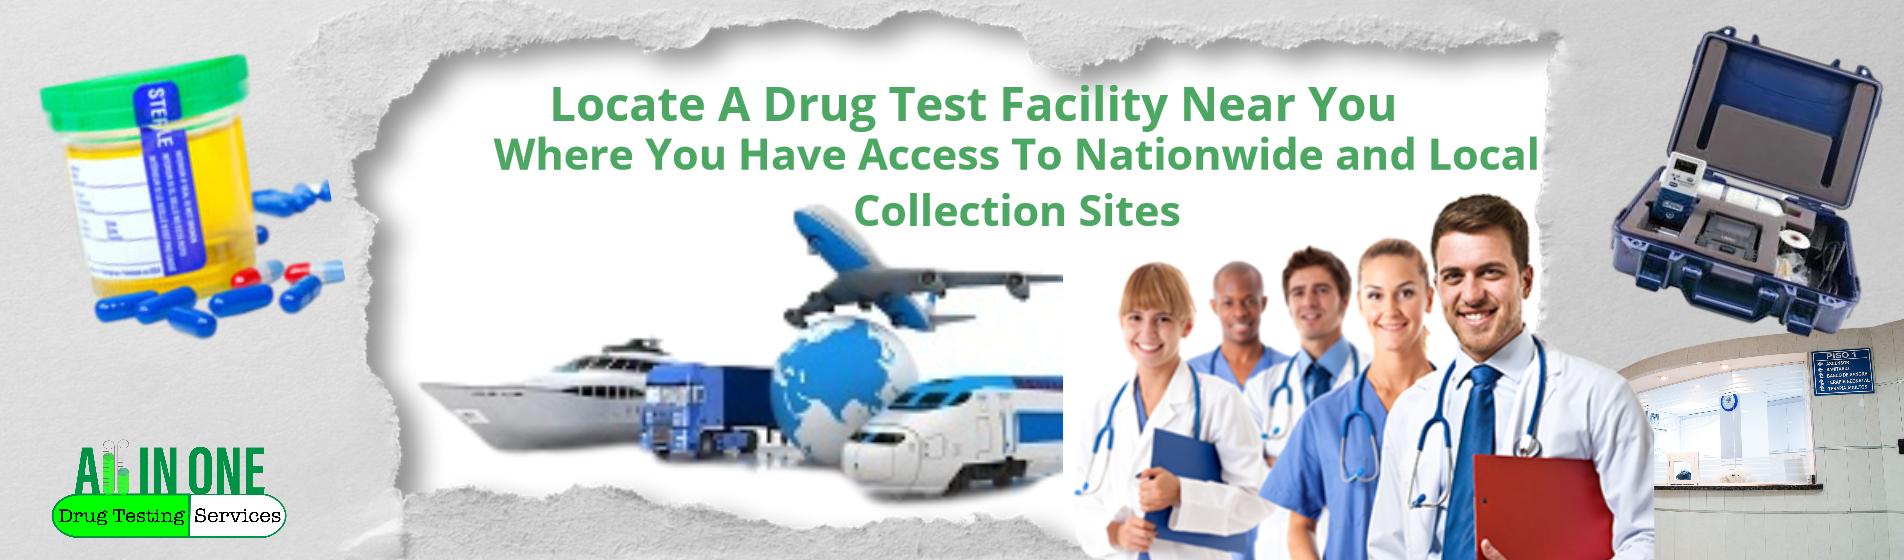 local drug test facilities, drug testing facilities near me, drug testing facilities in charlotte, nc, urine drug testing near me